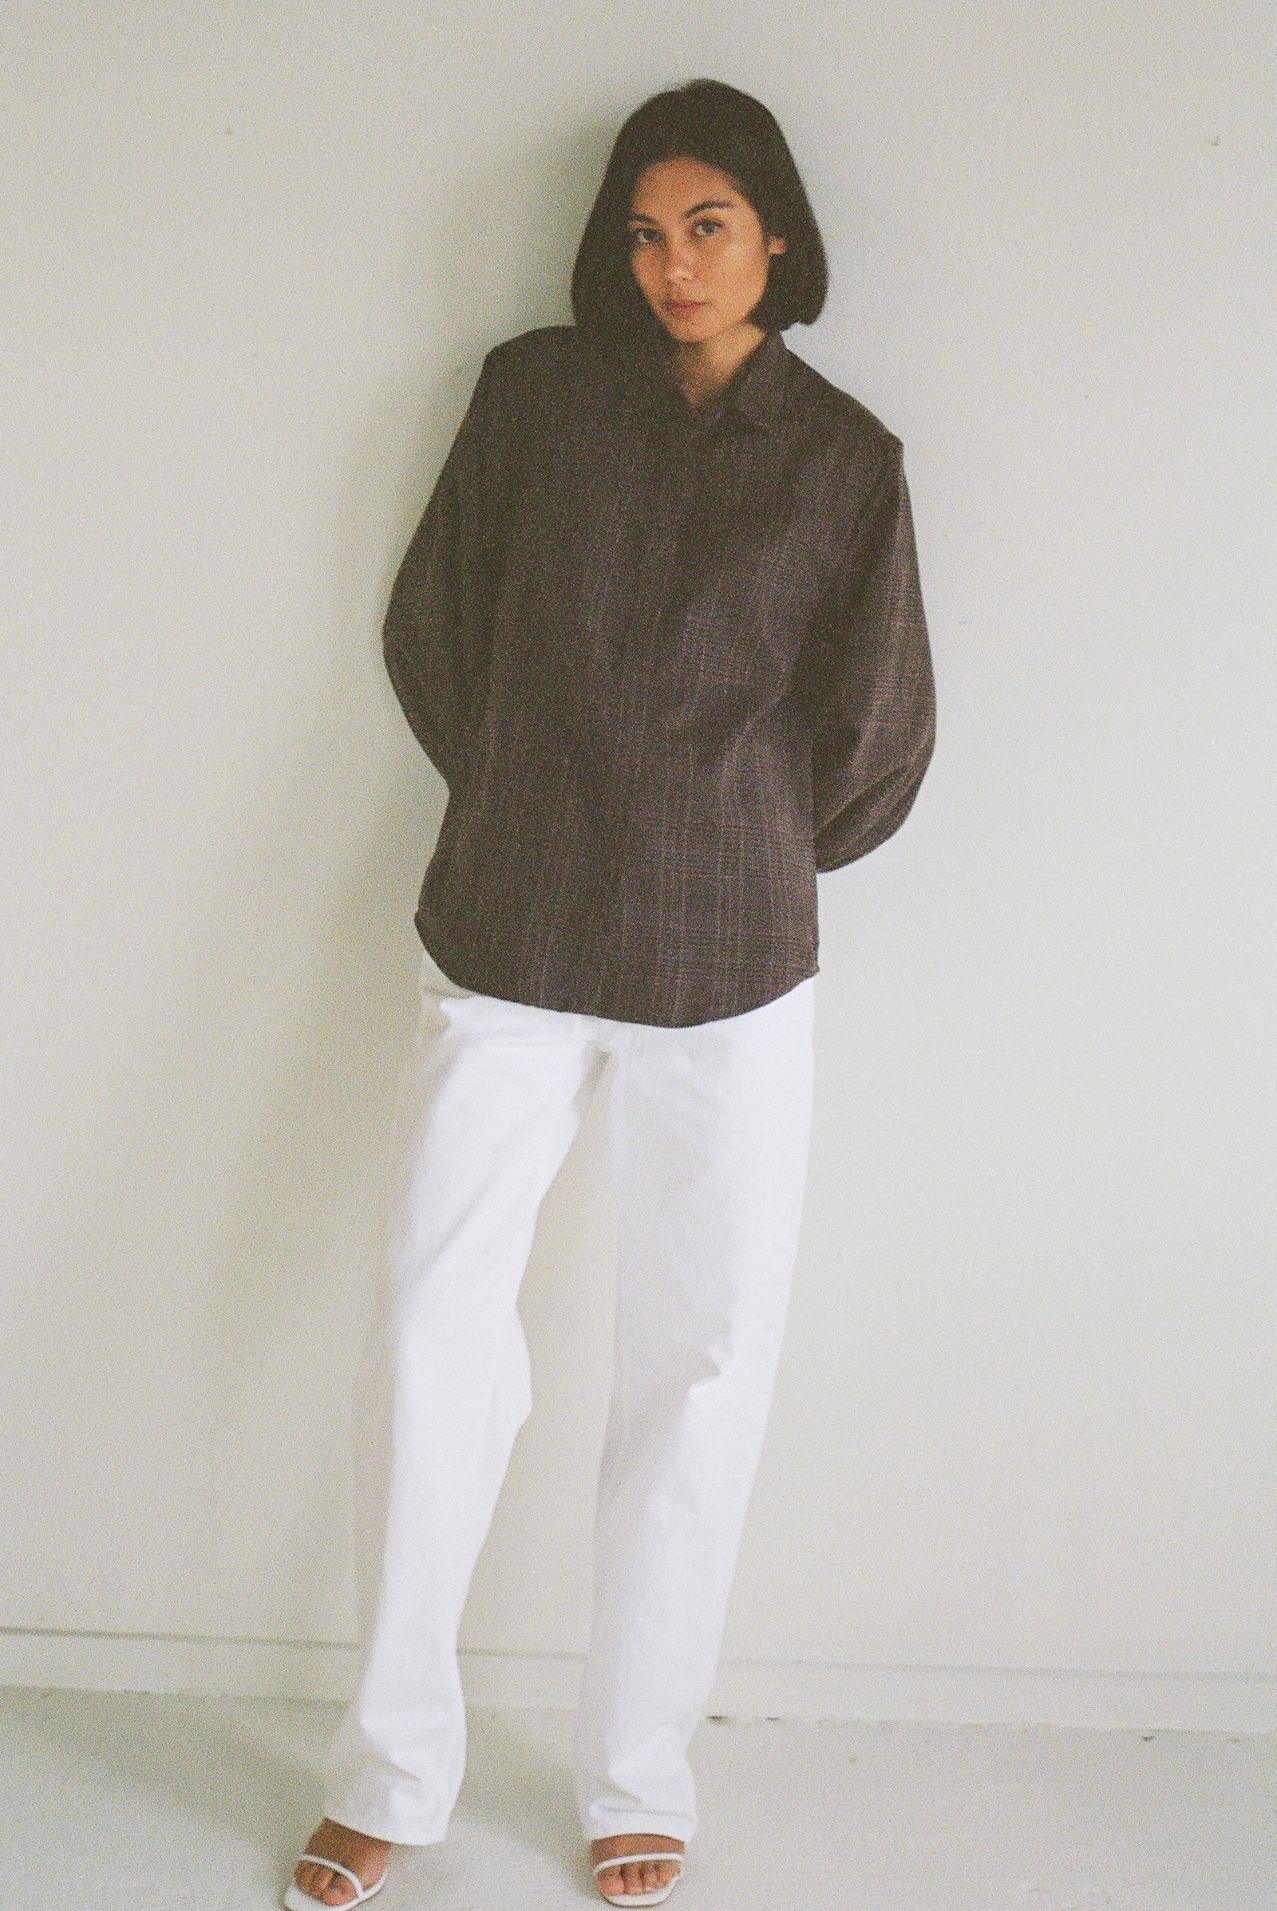 Mes deux shirt - Flannel - Ellis Label - Womens designer clothing NZ_0054_82970032